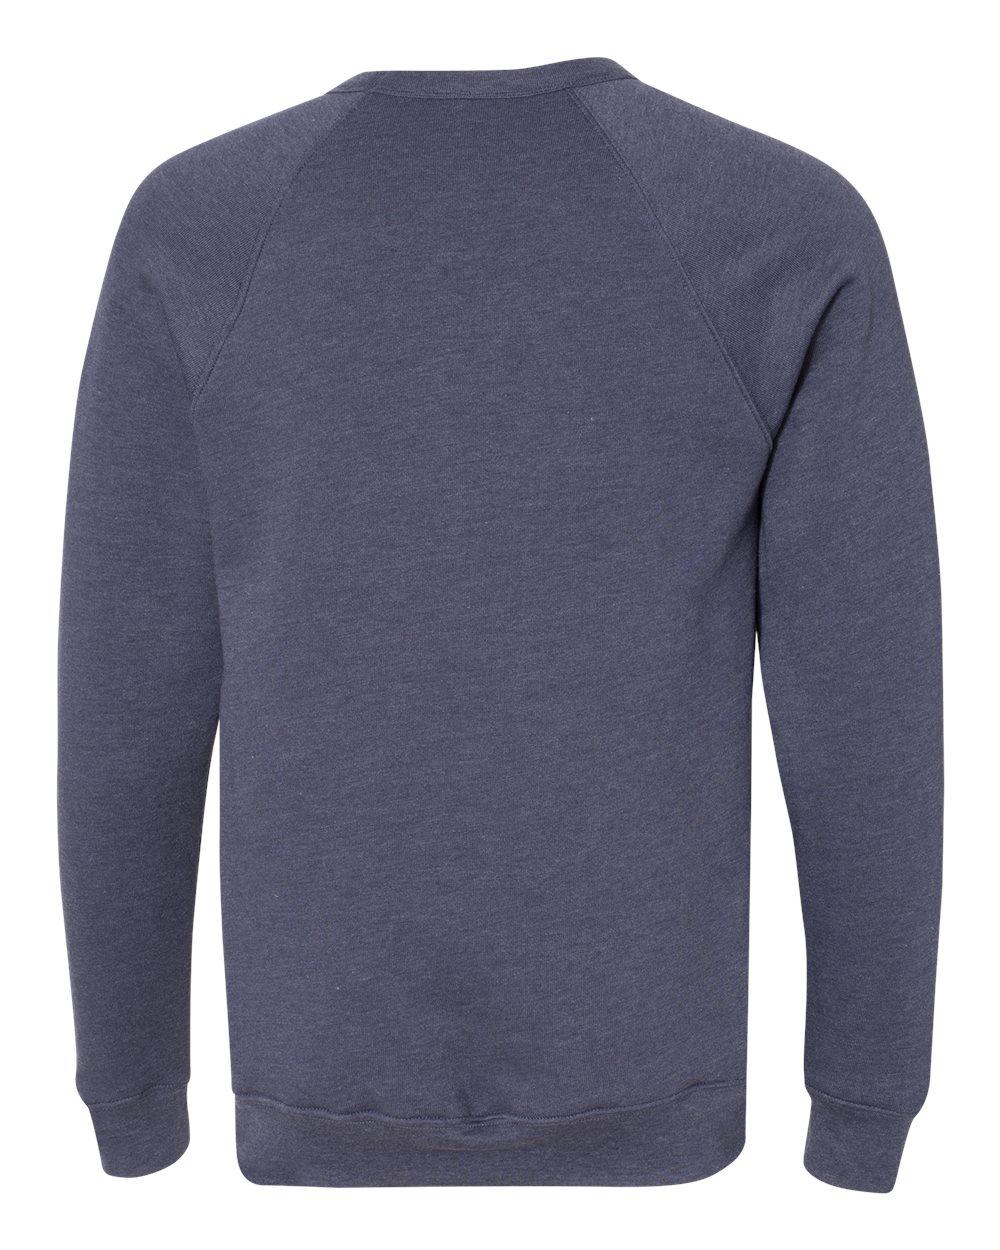 Bella-Canvas-Unisex-Sponge-Fleece-Crewneck-Sweatshirt-Top-Blank-3901-up-to-2XL thumbnail 41